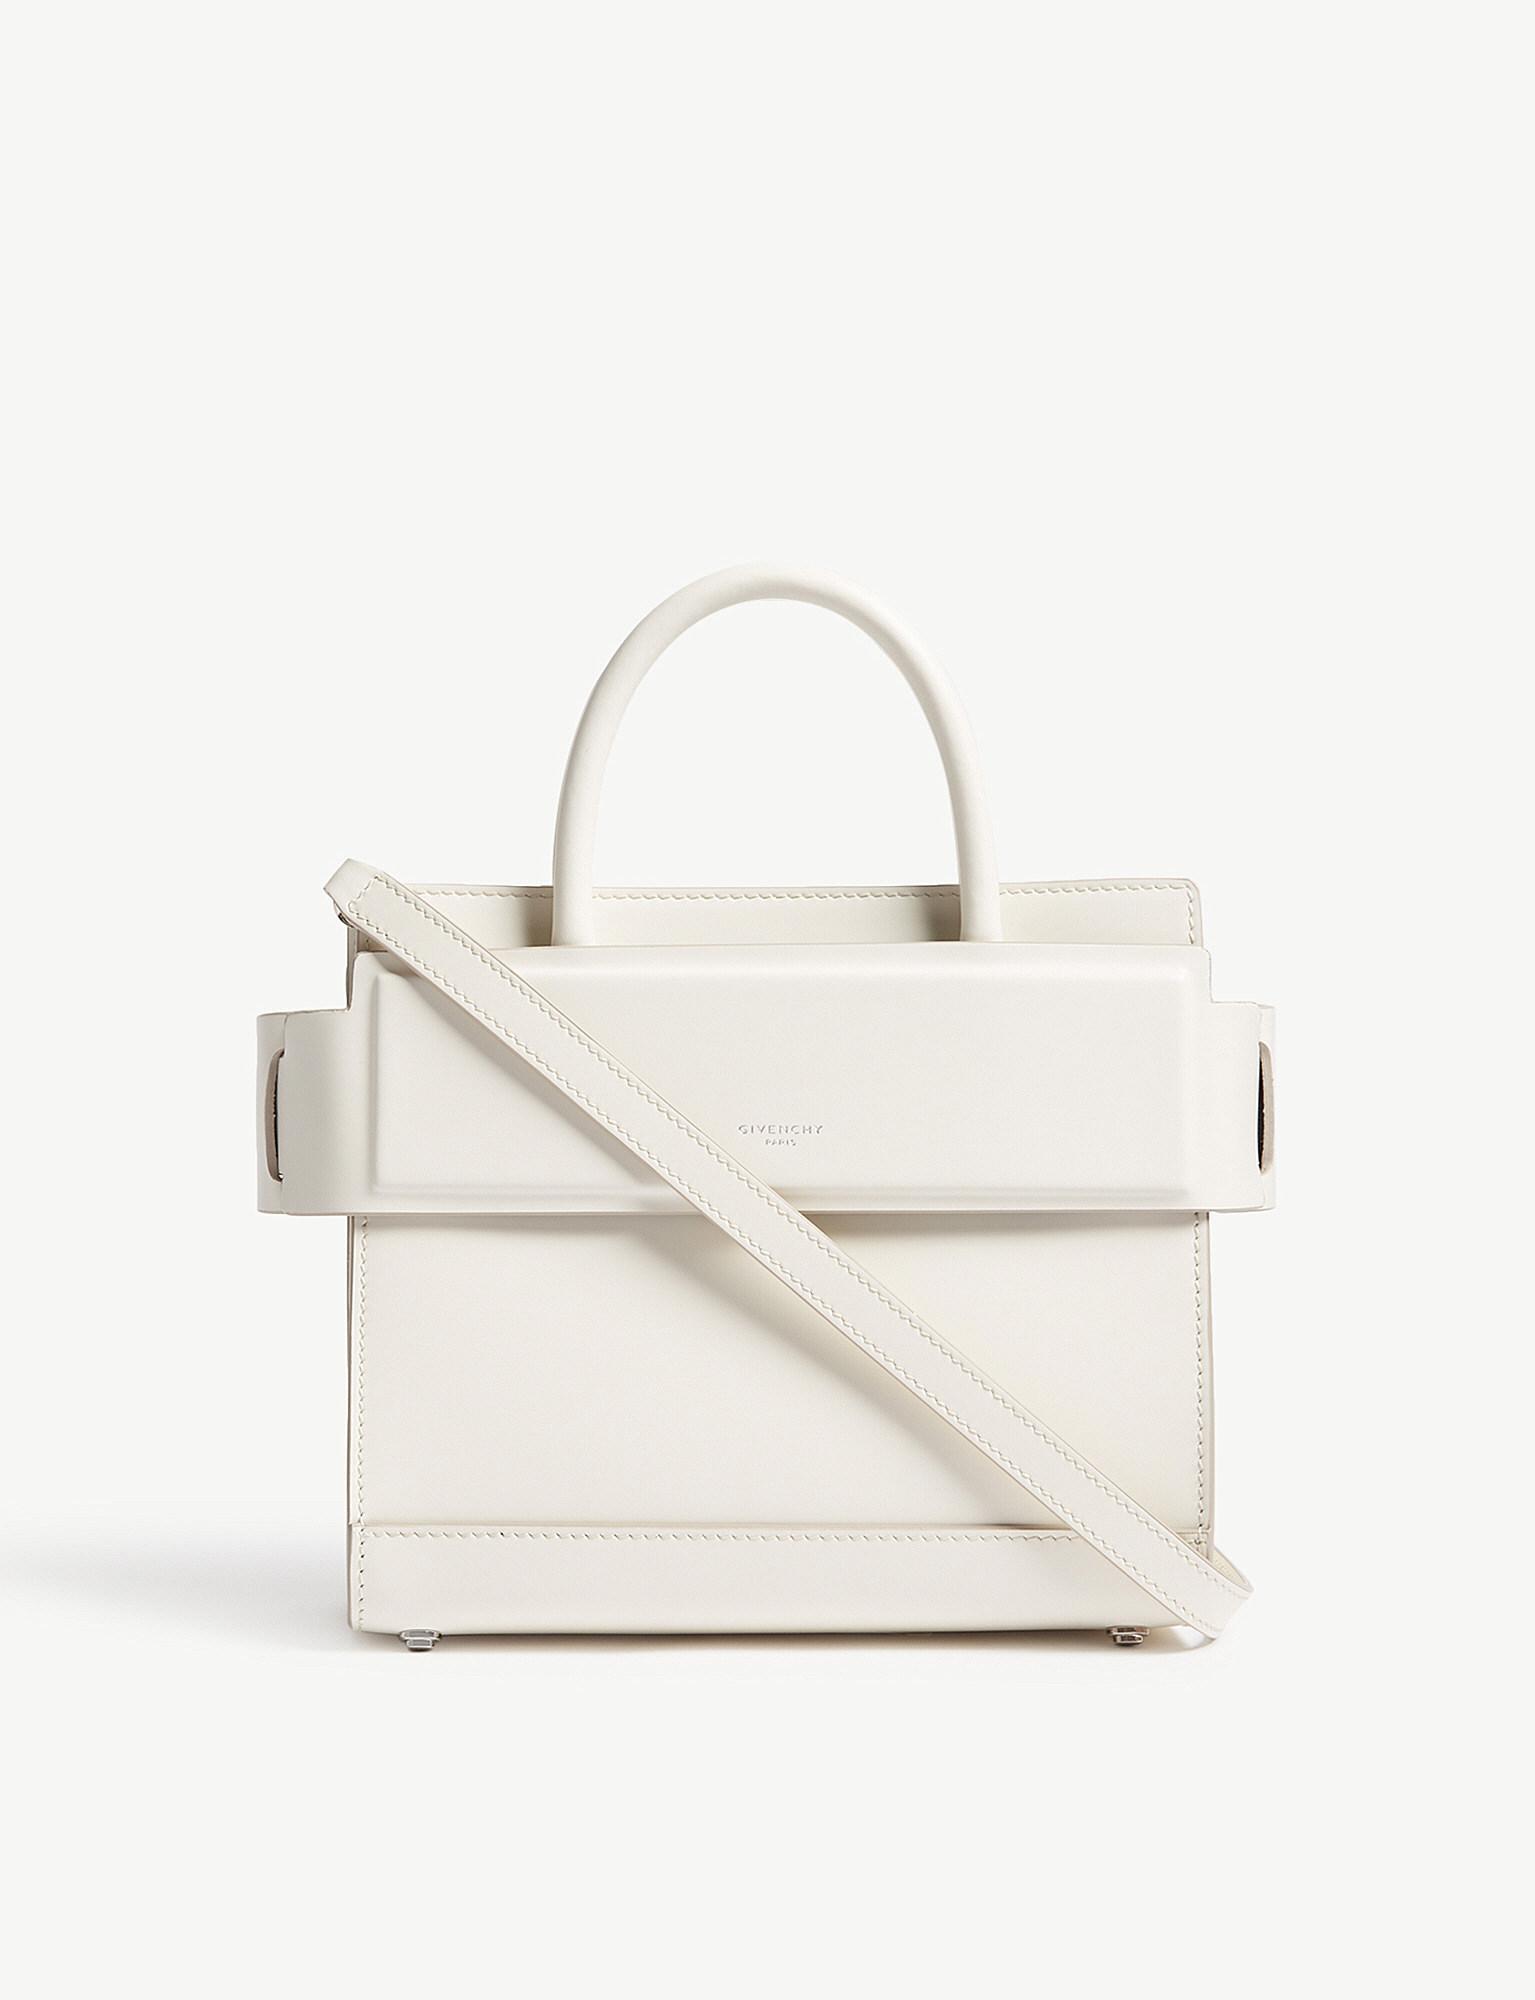 8b48a96c921e Lyst - Givenchy Horizon Mini Leather Cross-body Bag in White